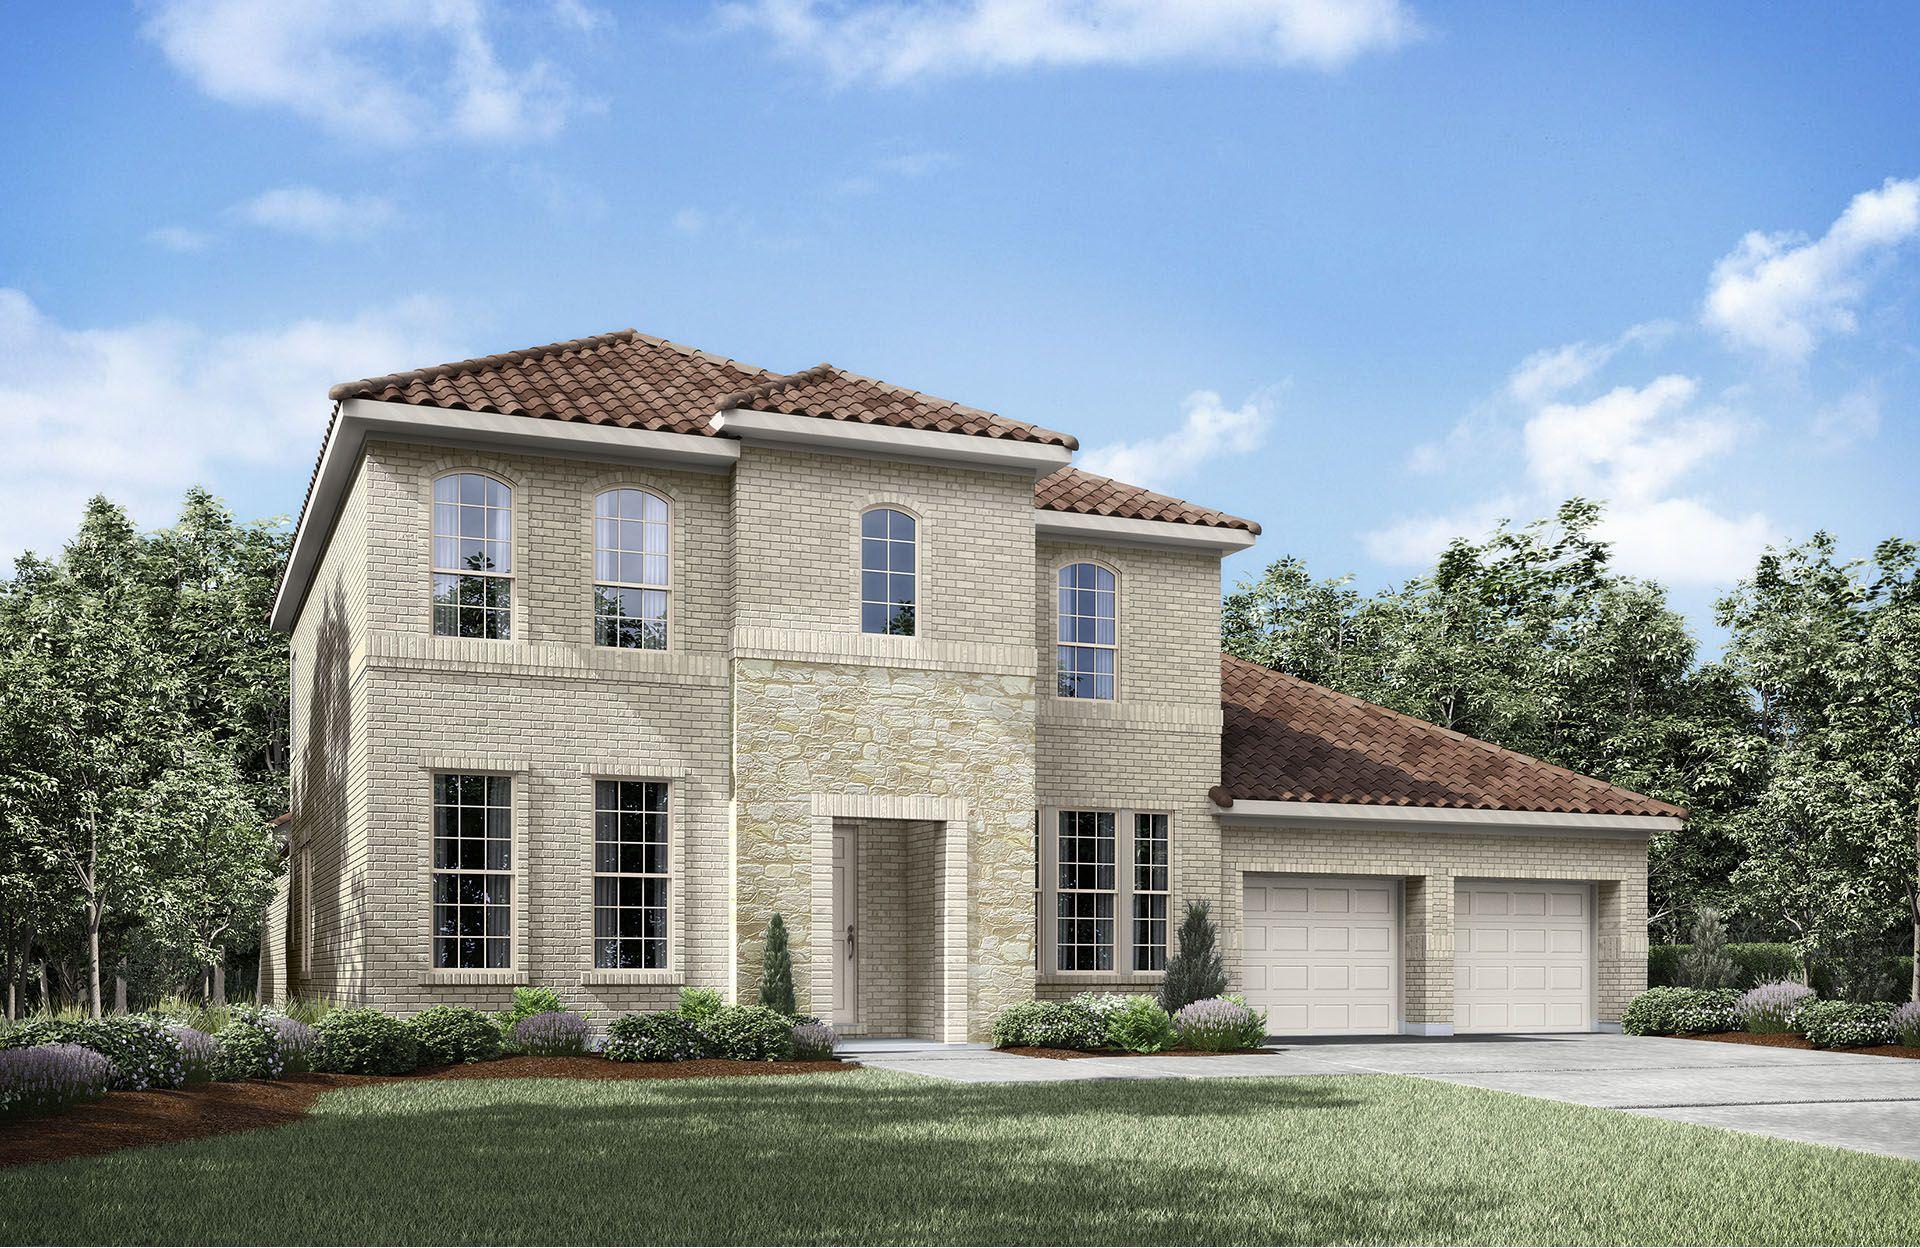 Single Family for Sale at Union Park - Tanner 4908 Union Park Boulevard East Aubrey, Texas 76227 United States